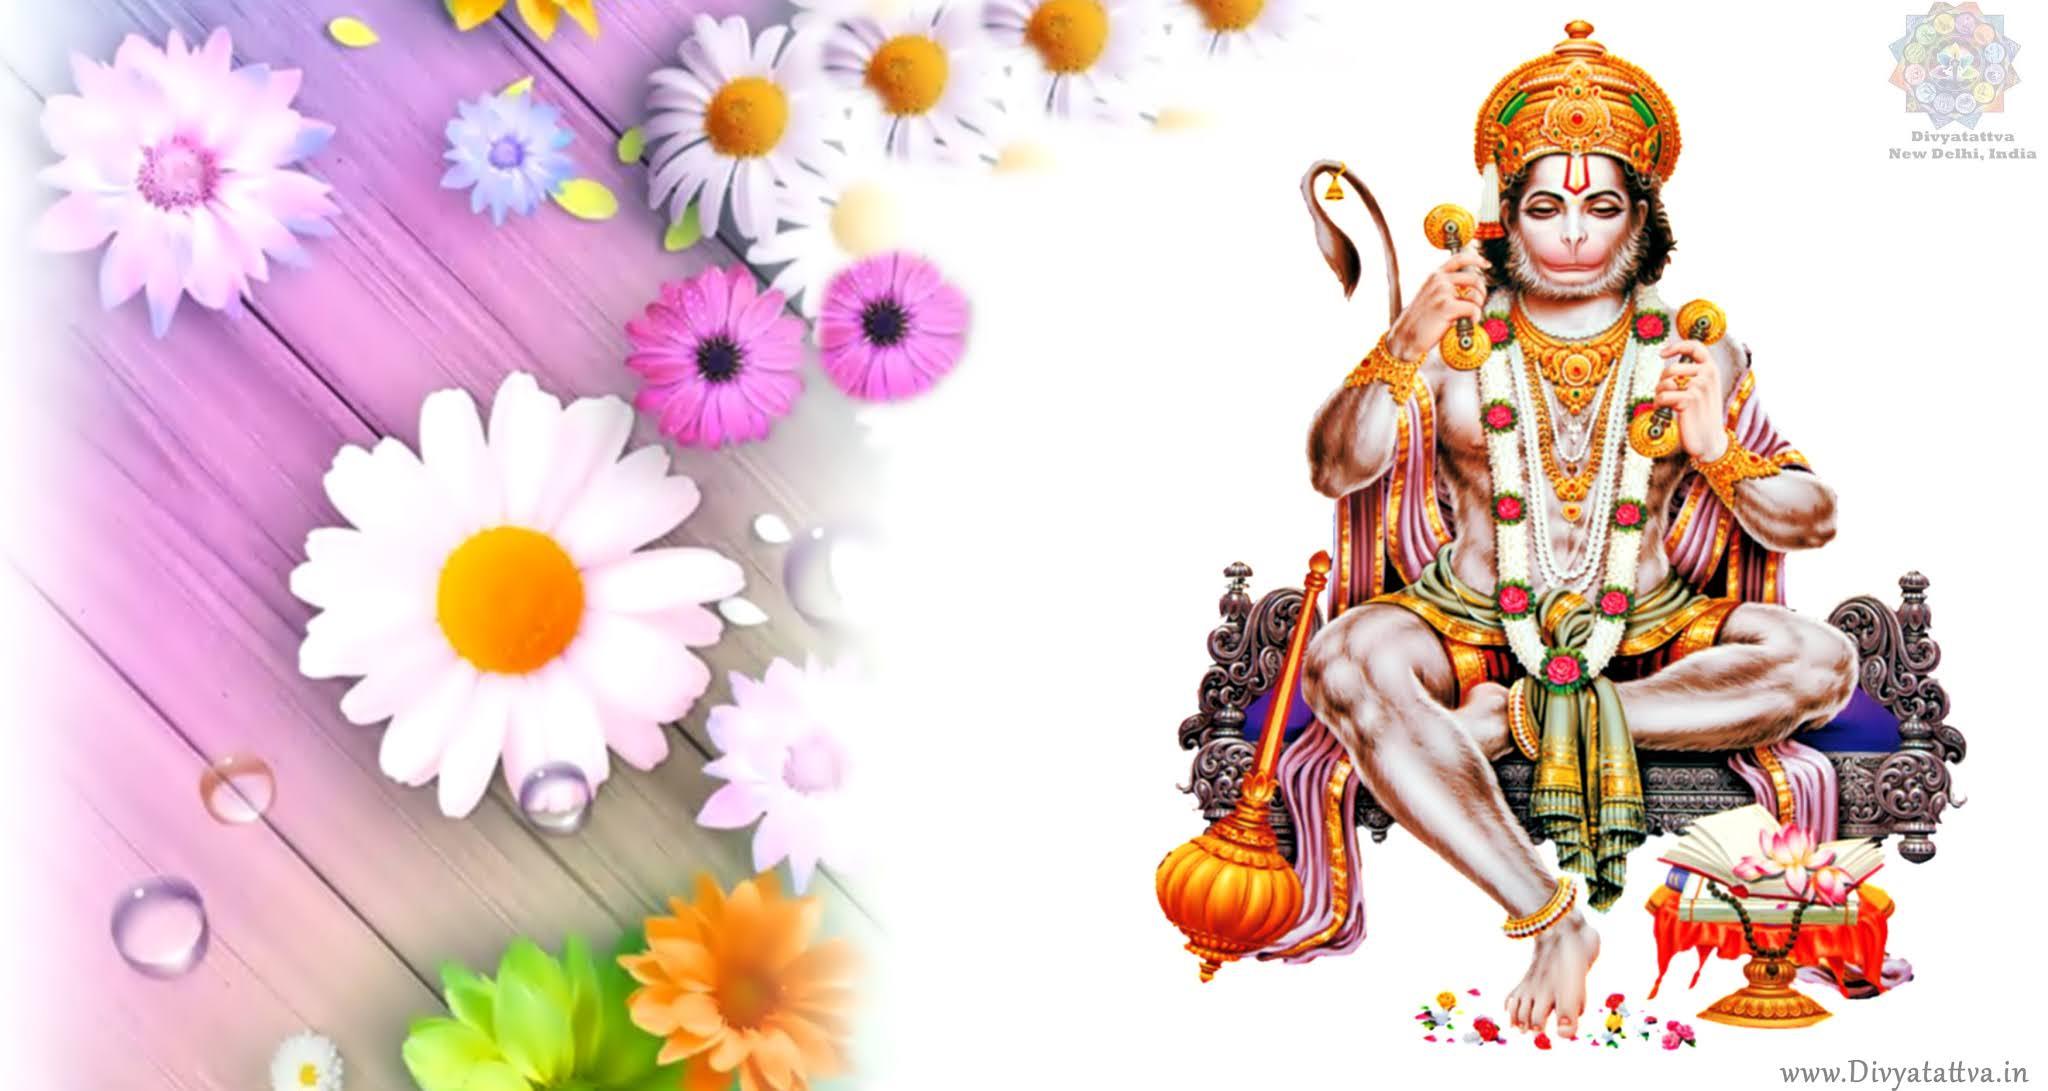 Hanuman Ji ka photo, Hanuman Jayanti Wallpapers, Lord Hanuman Pictures in 4K HD, Hindu God Hanuman Ji Stock Photos & Images